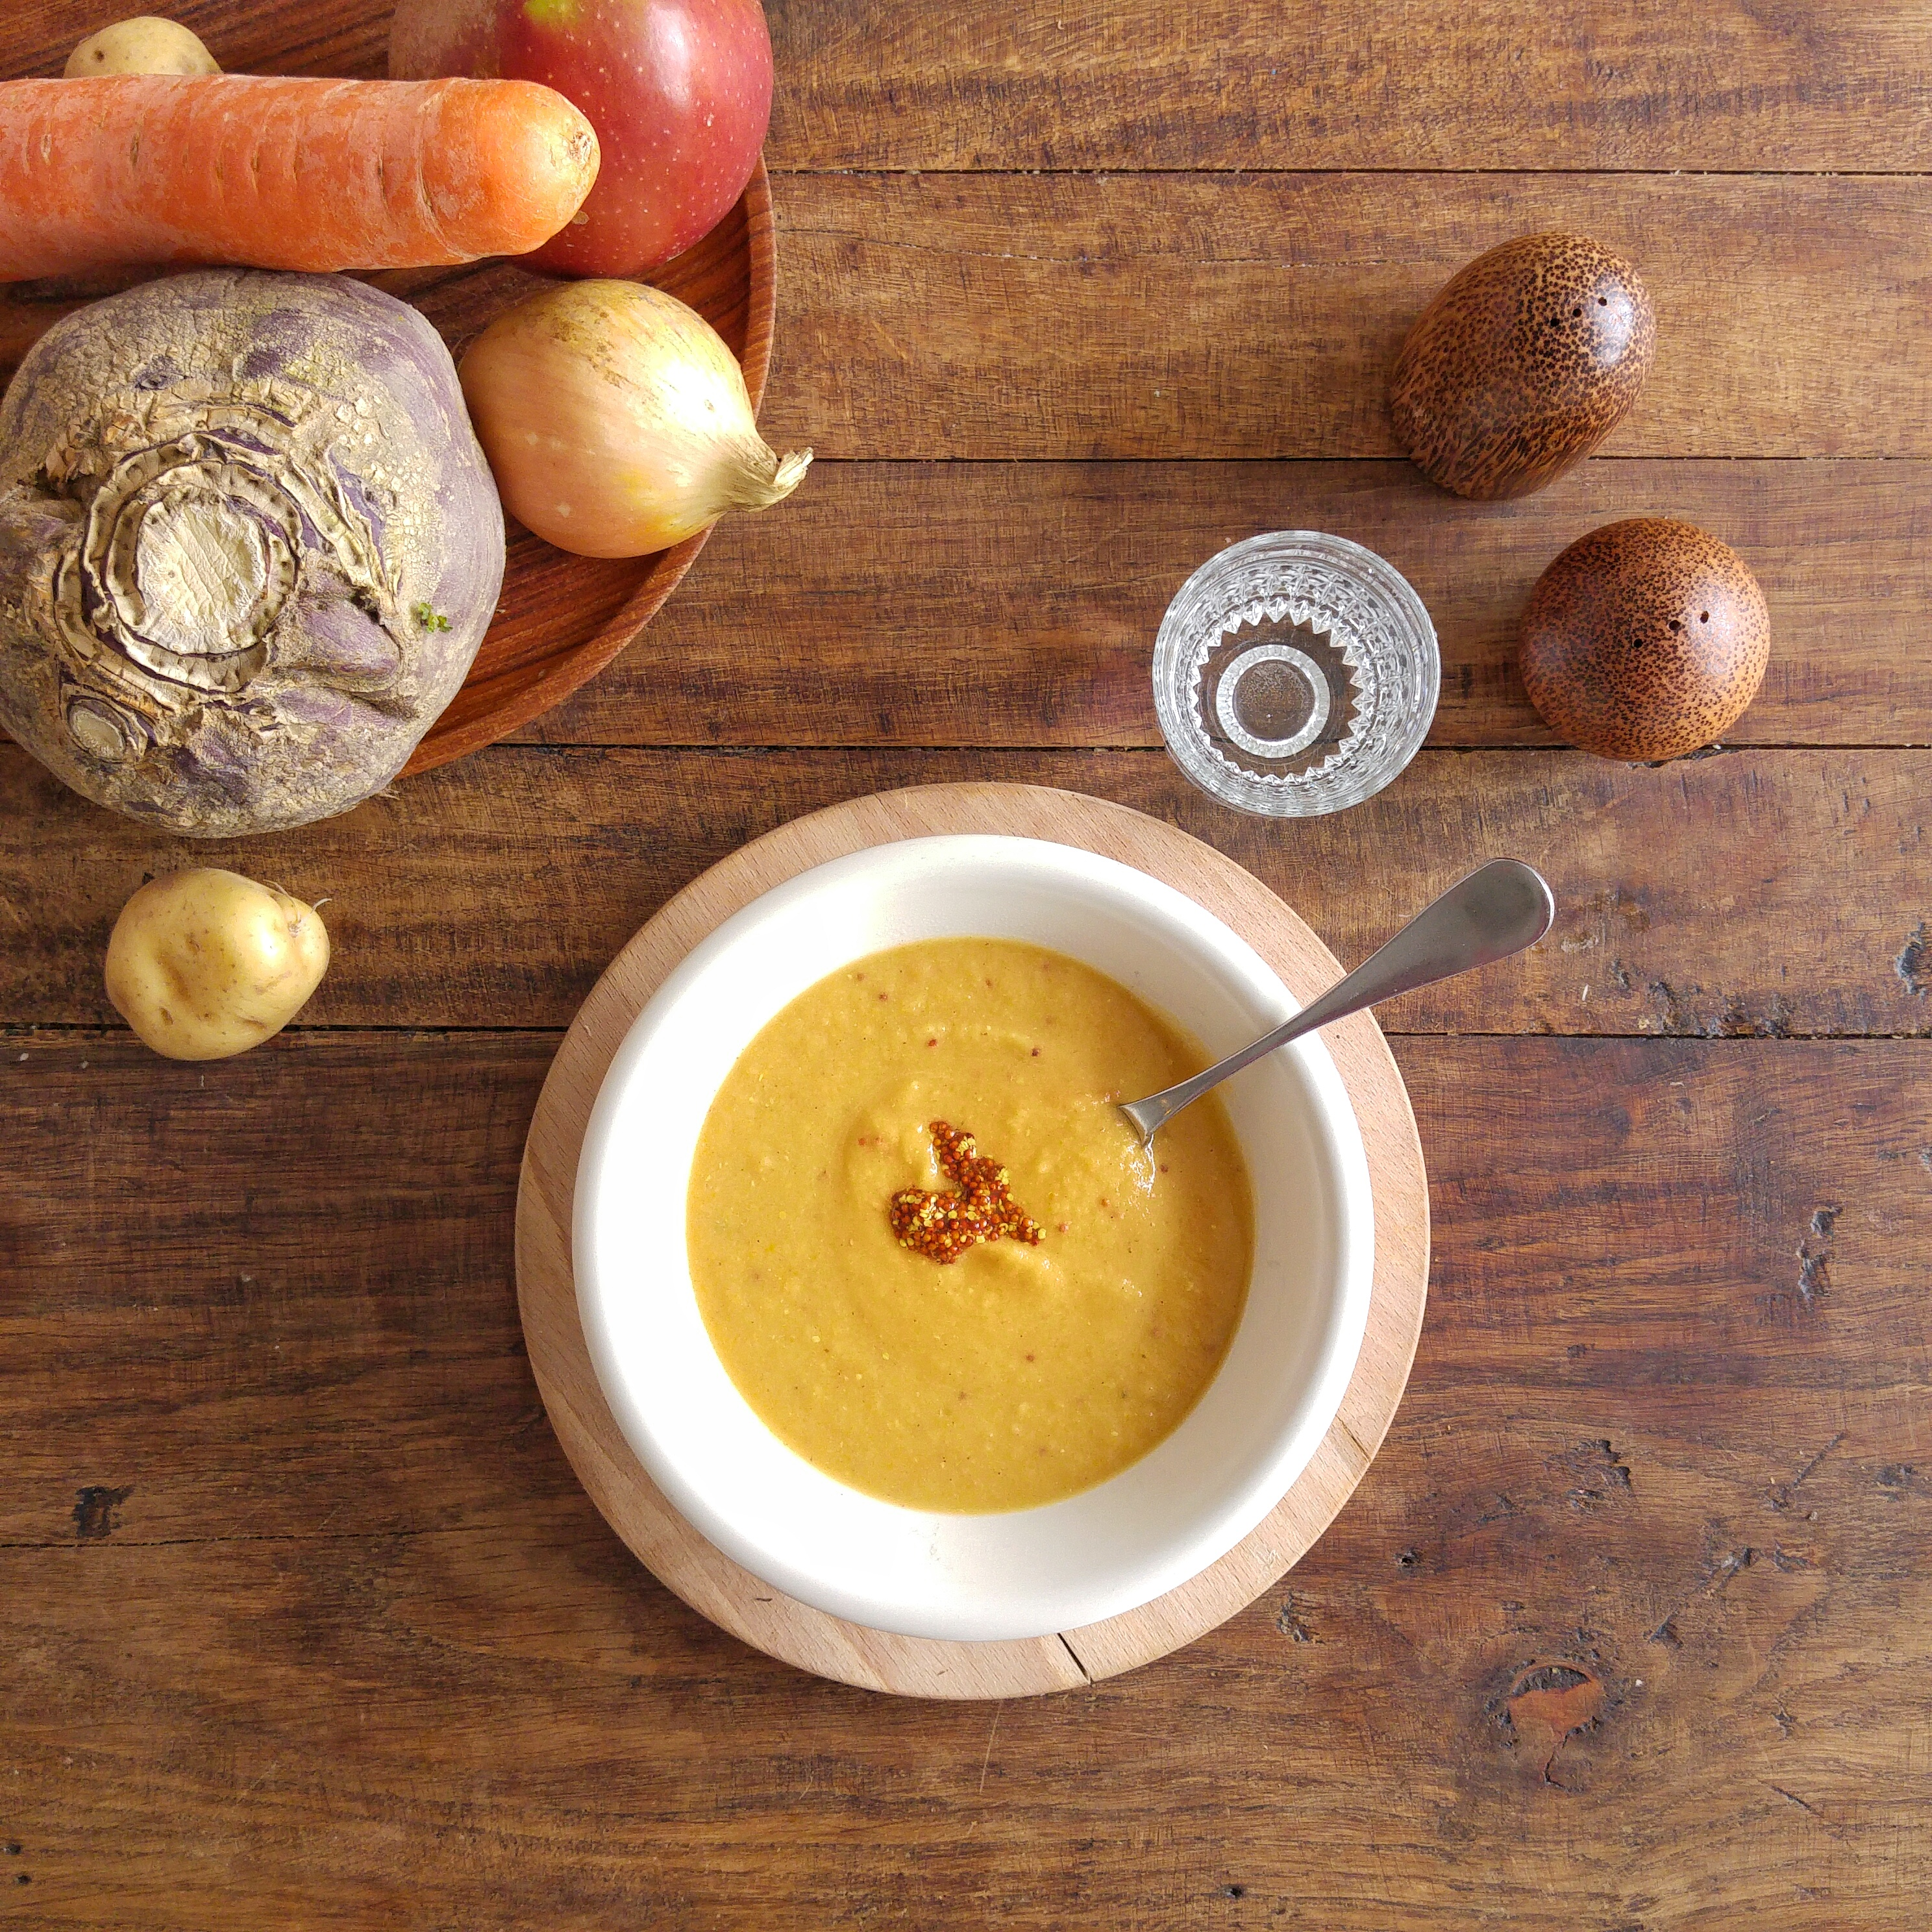 koolraap-soep-met-mosterd-en-appel-recept